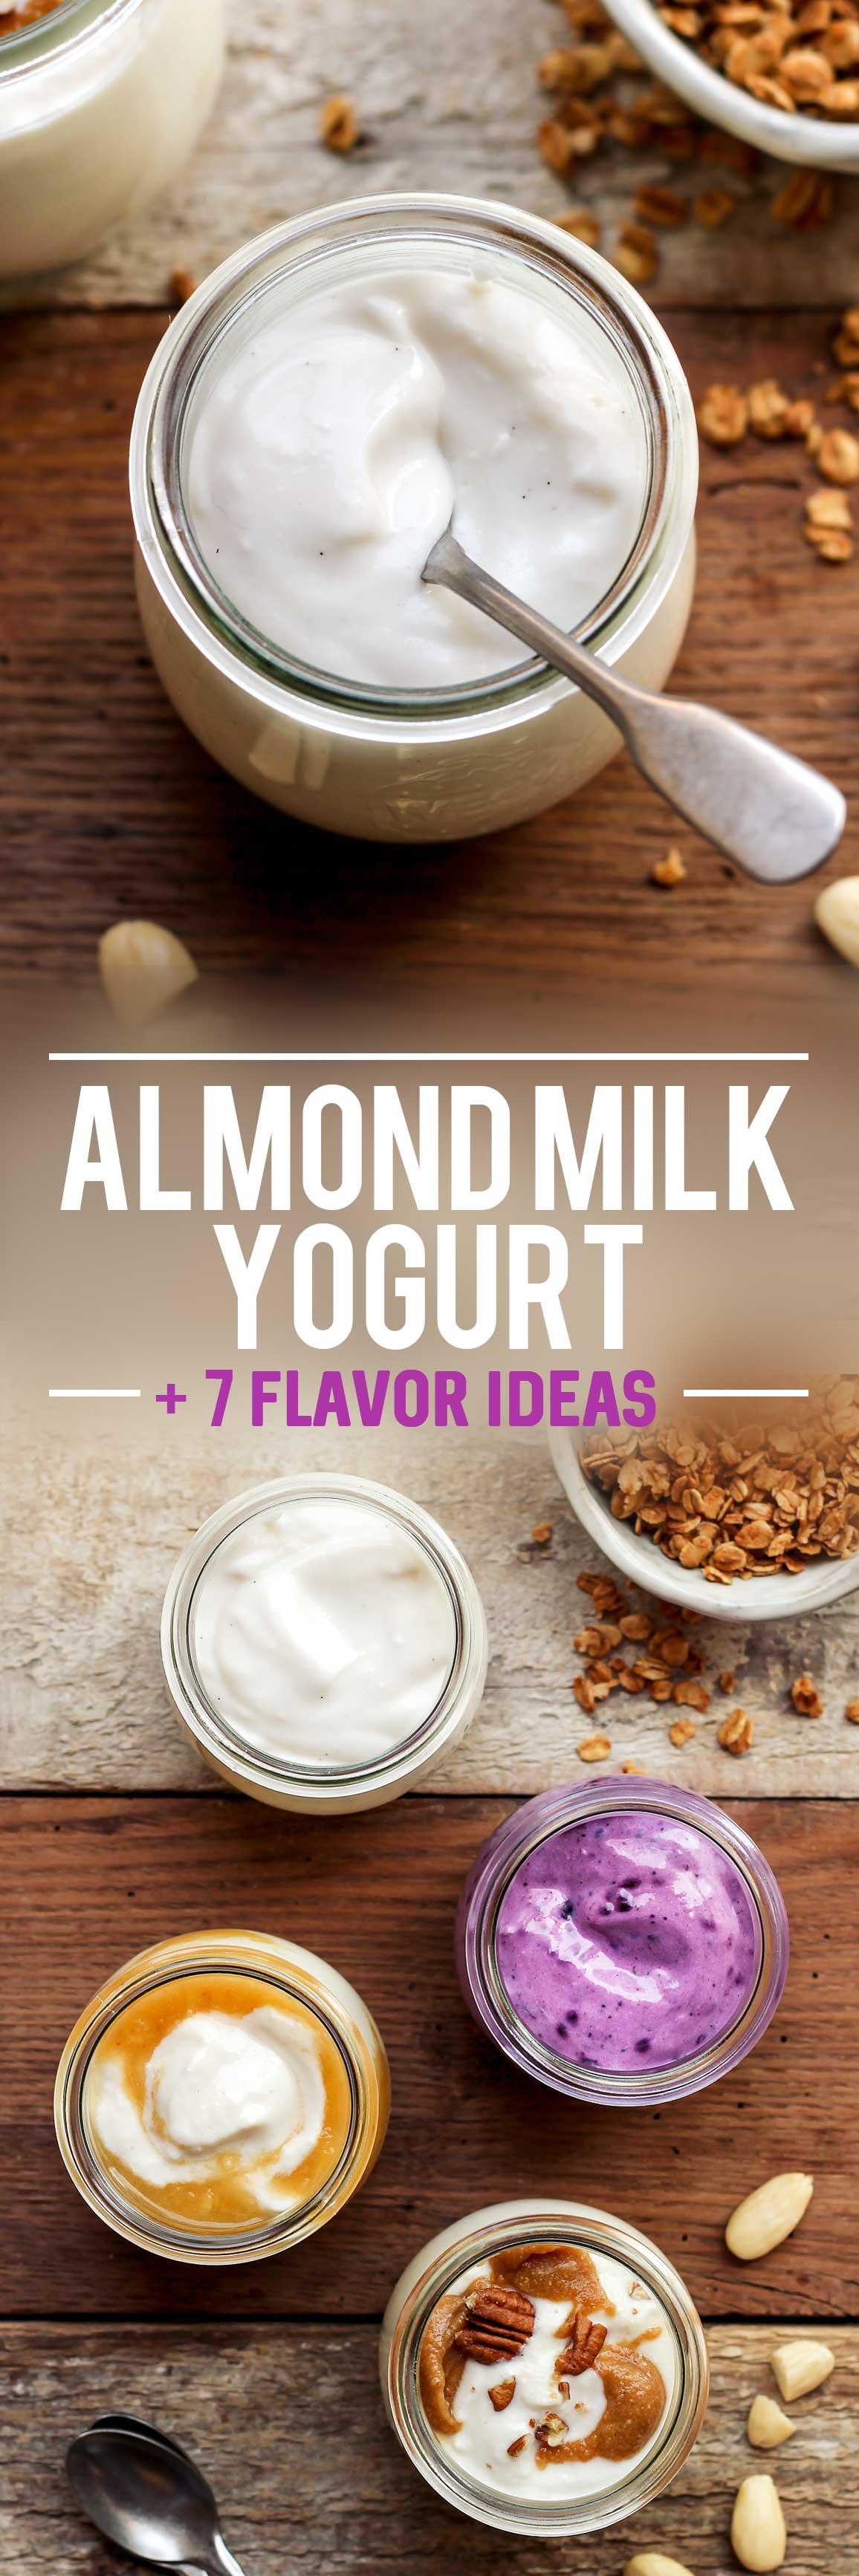 Harmful food supplements - why yogurt is pink, and sausage is not dark brown